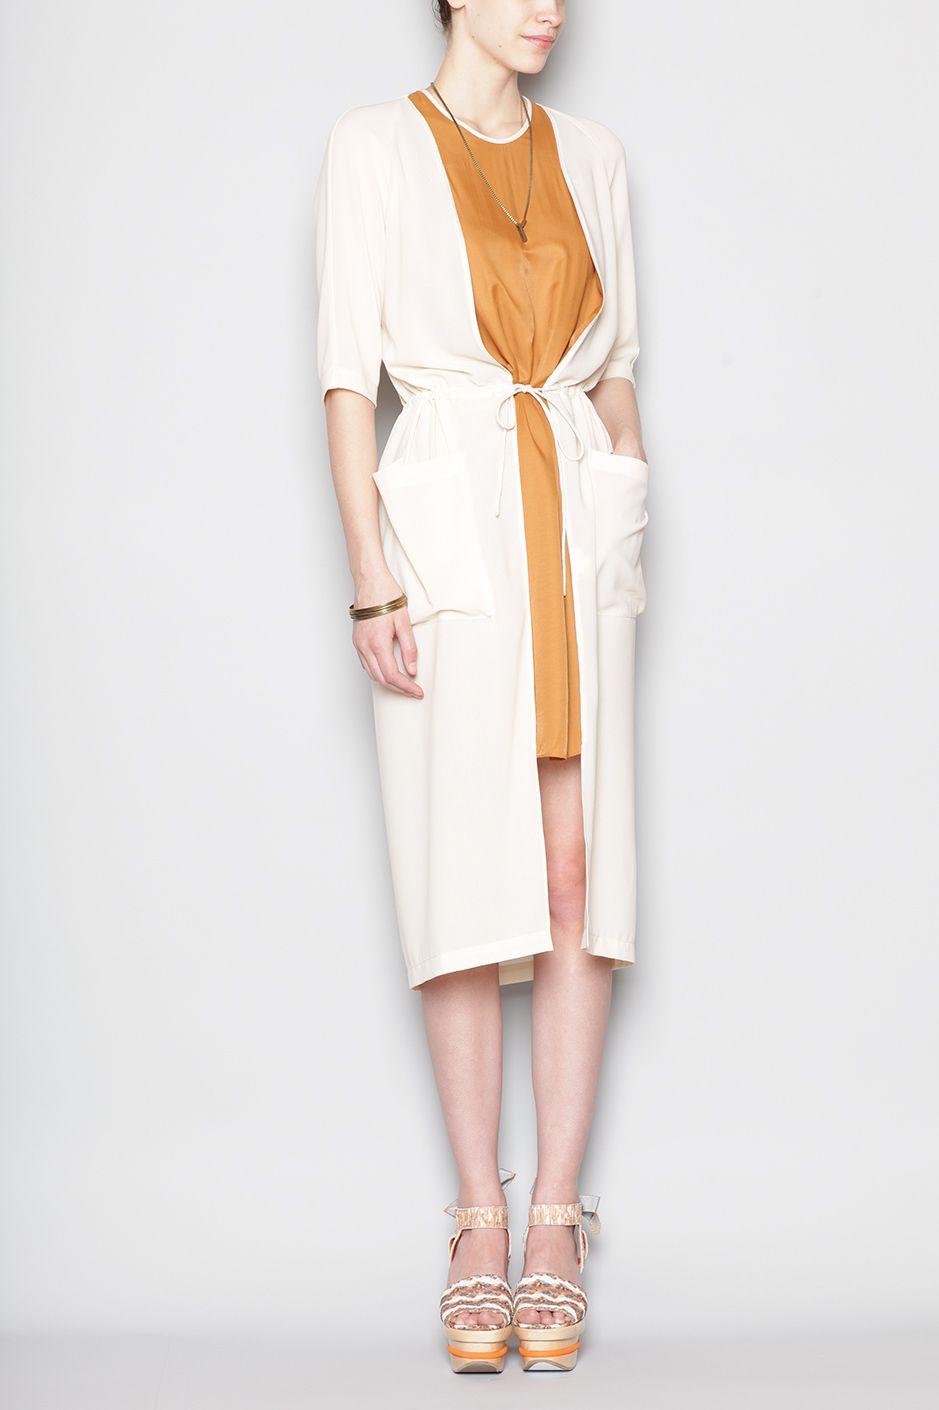 Henrik Vibskov Vero Dress (Mustard/Off White)